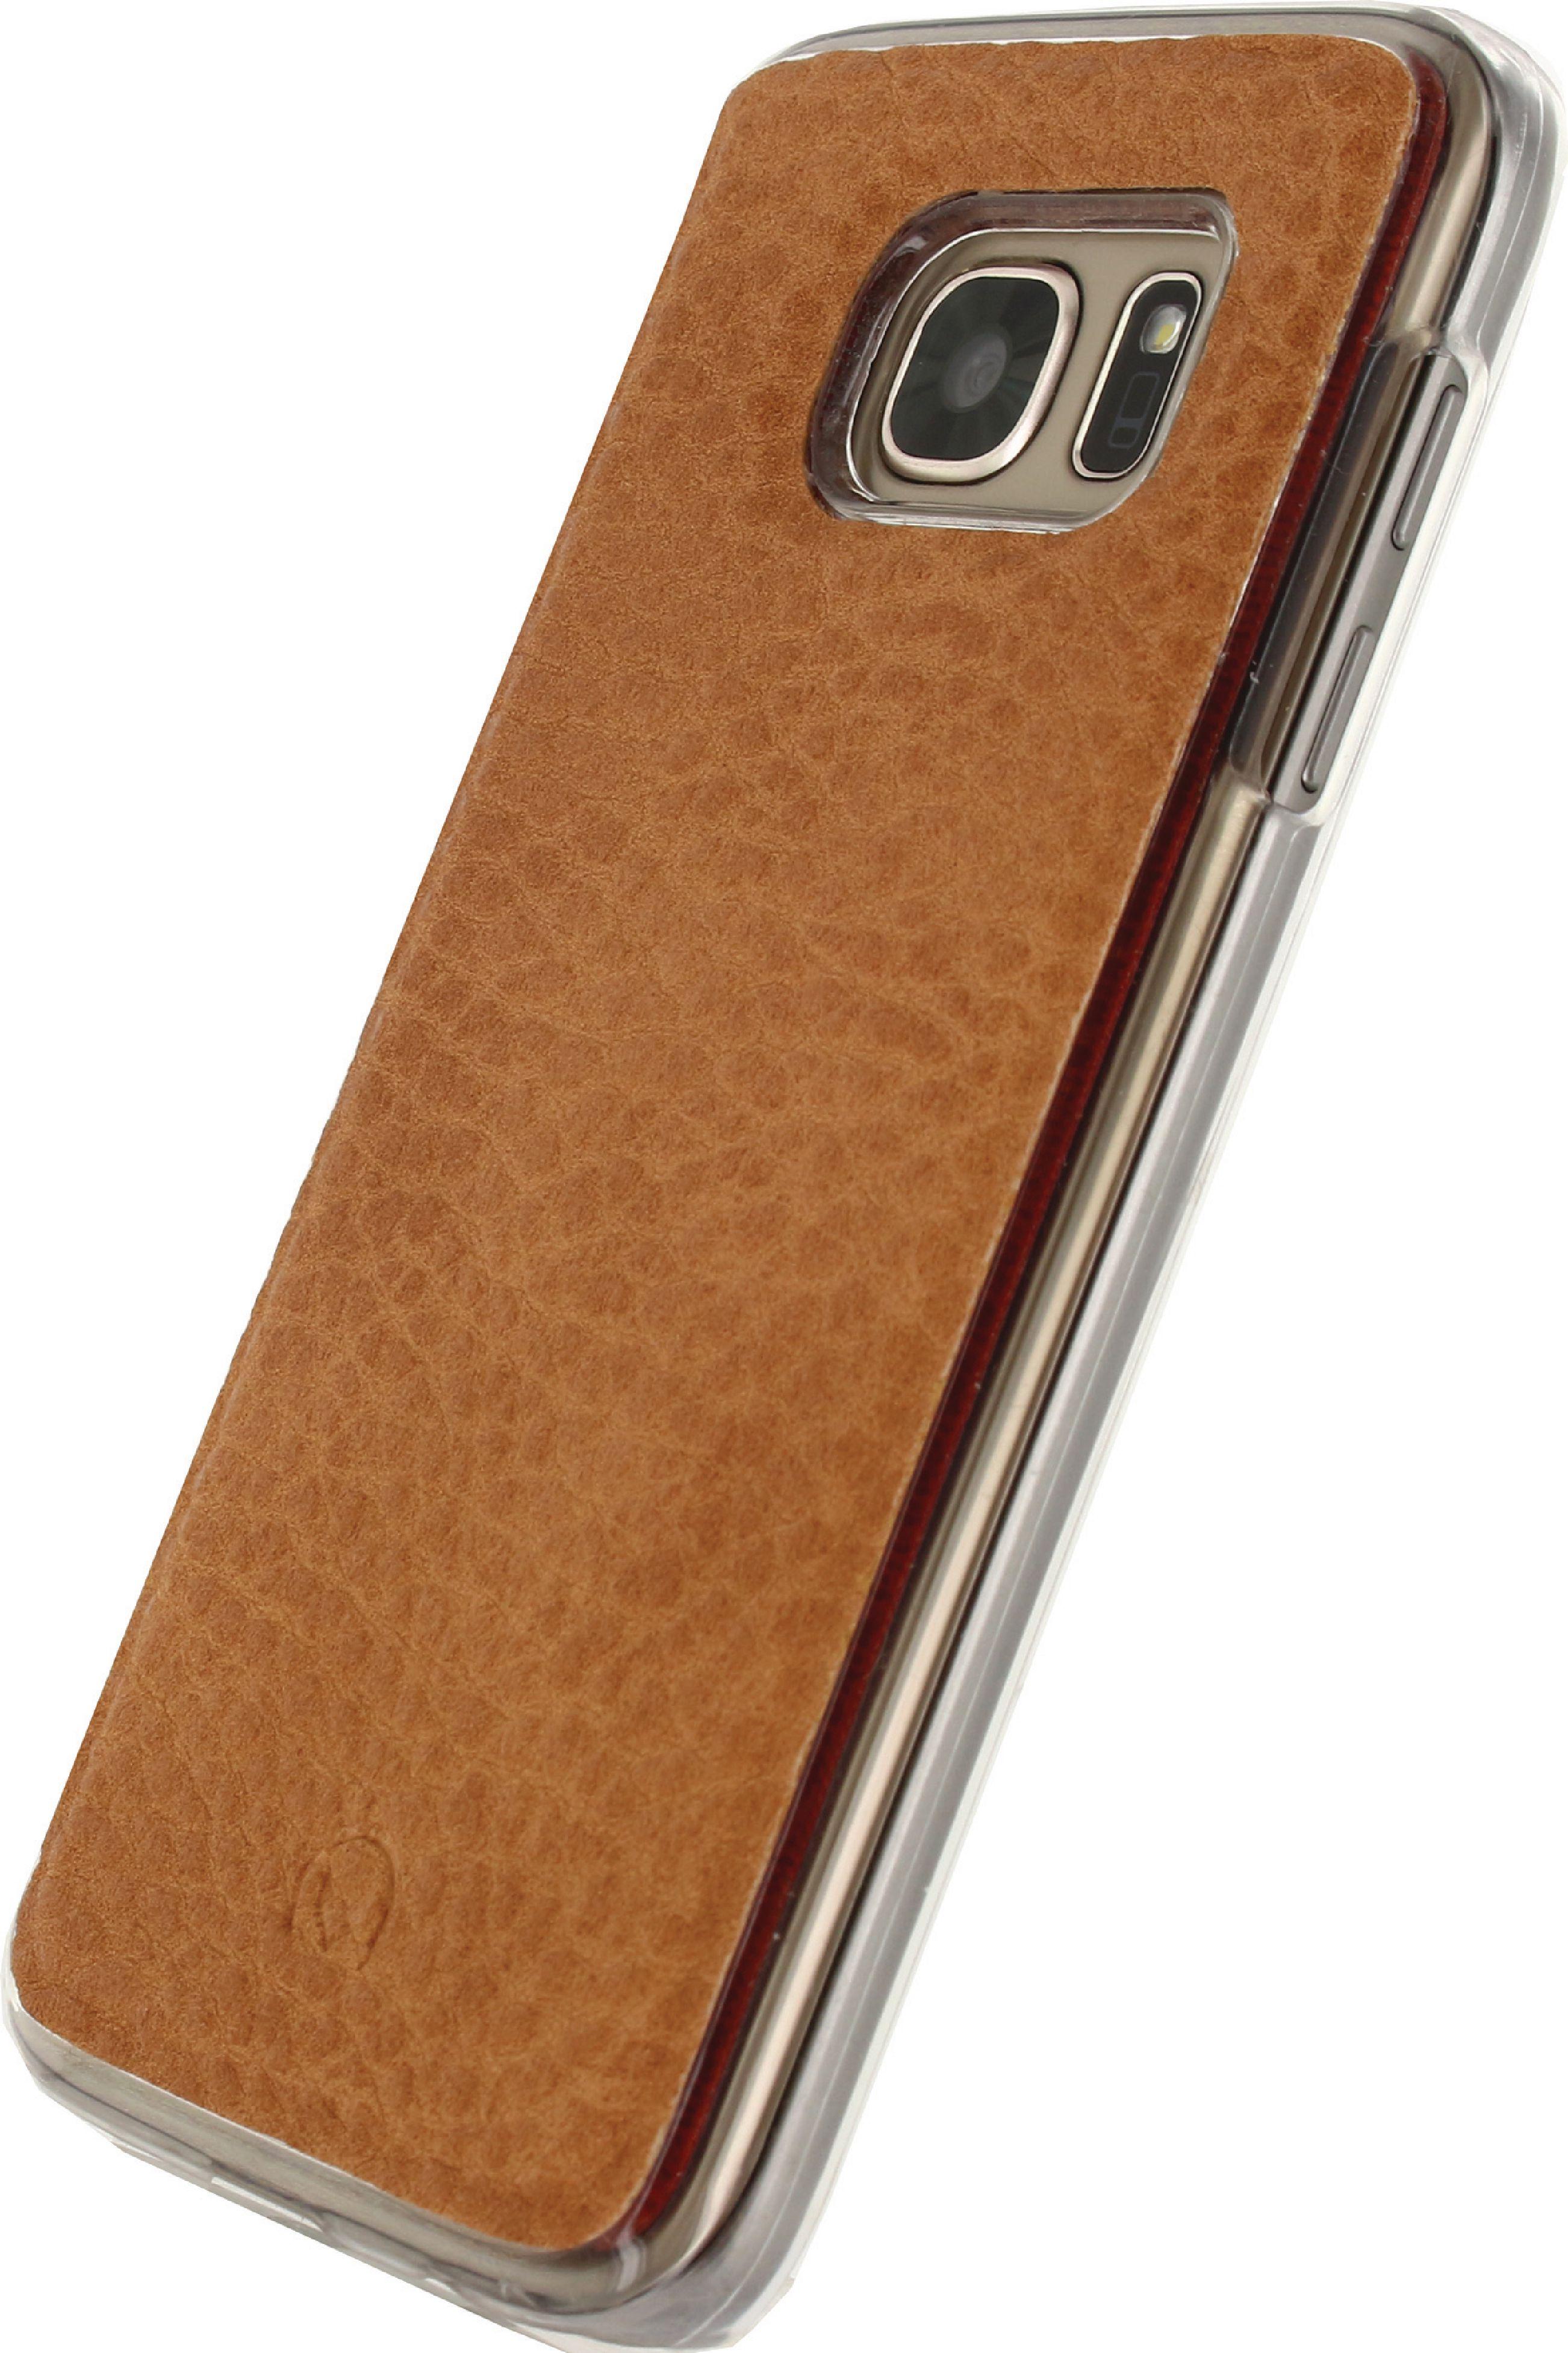 Image of   Telefon Aftageligt Lommebogsetui Samsung Galaxy S7 Brun